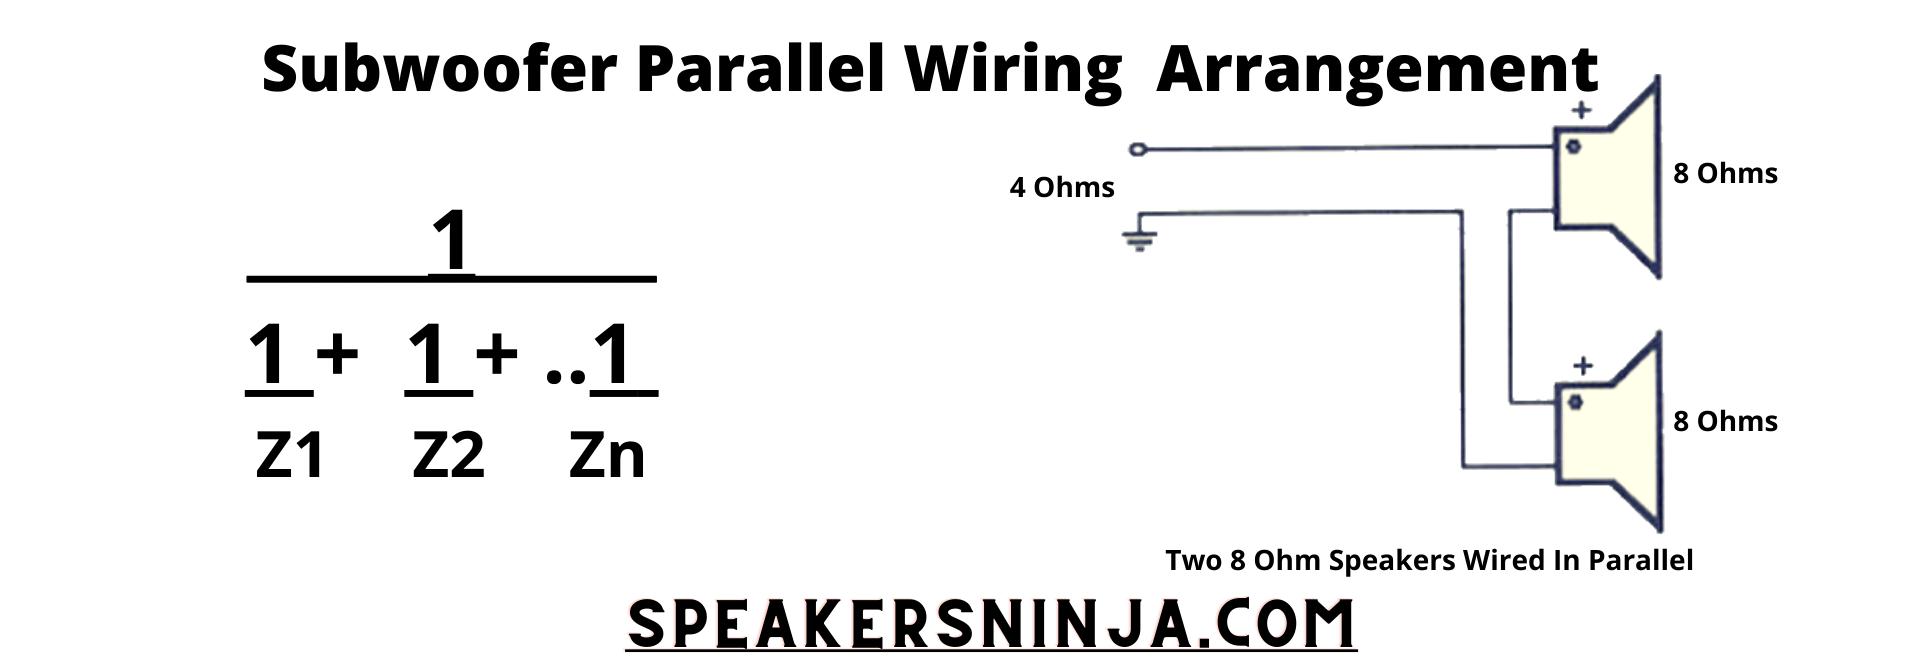 Subwoofer Parallel Wiring Arrangement